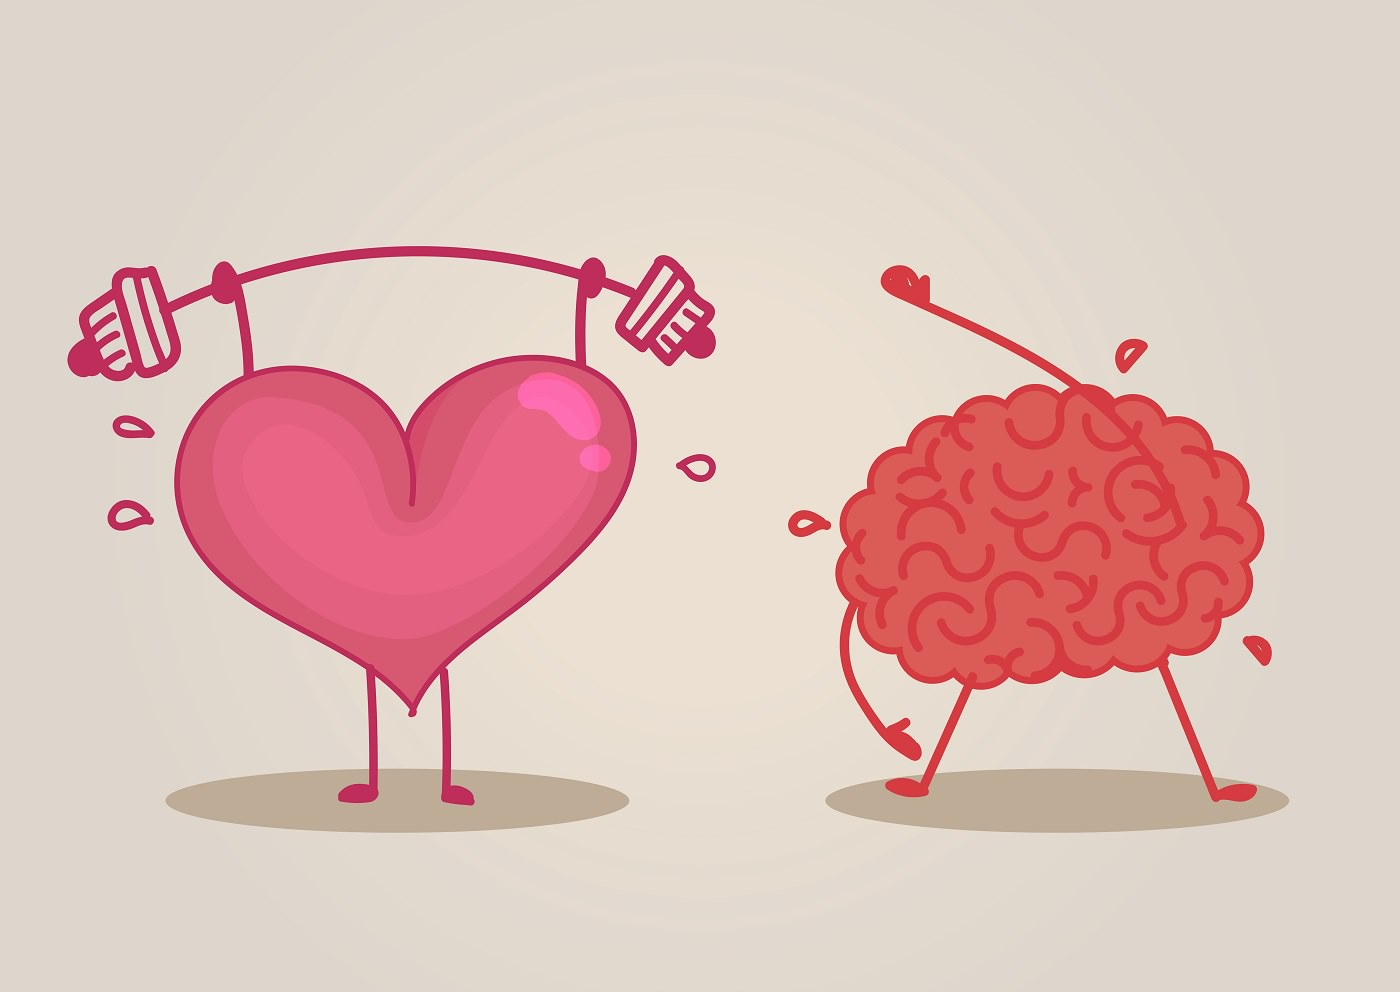 Brain & heart characters